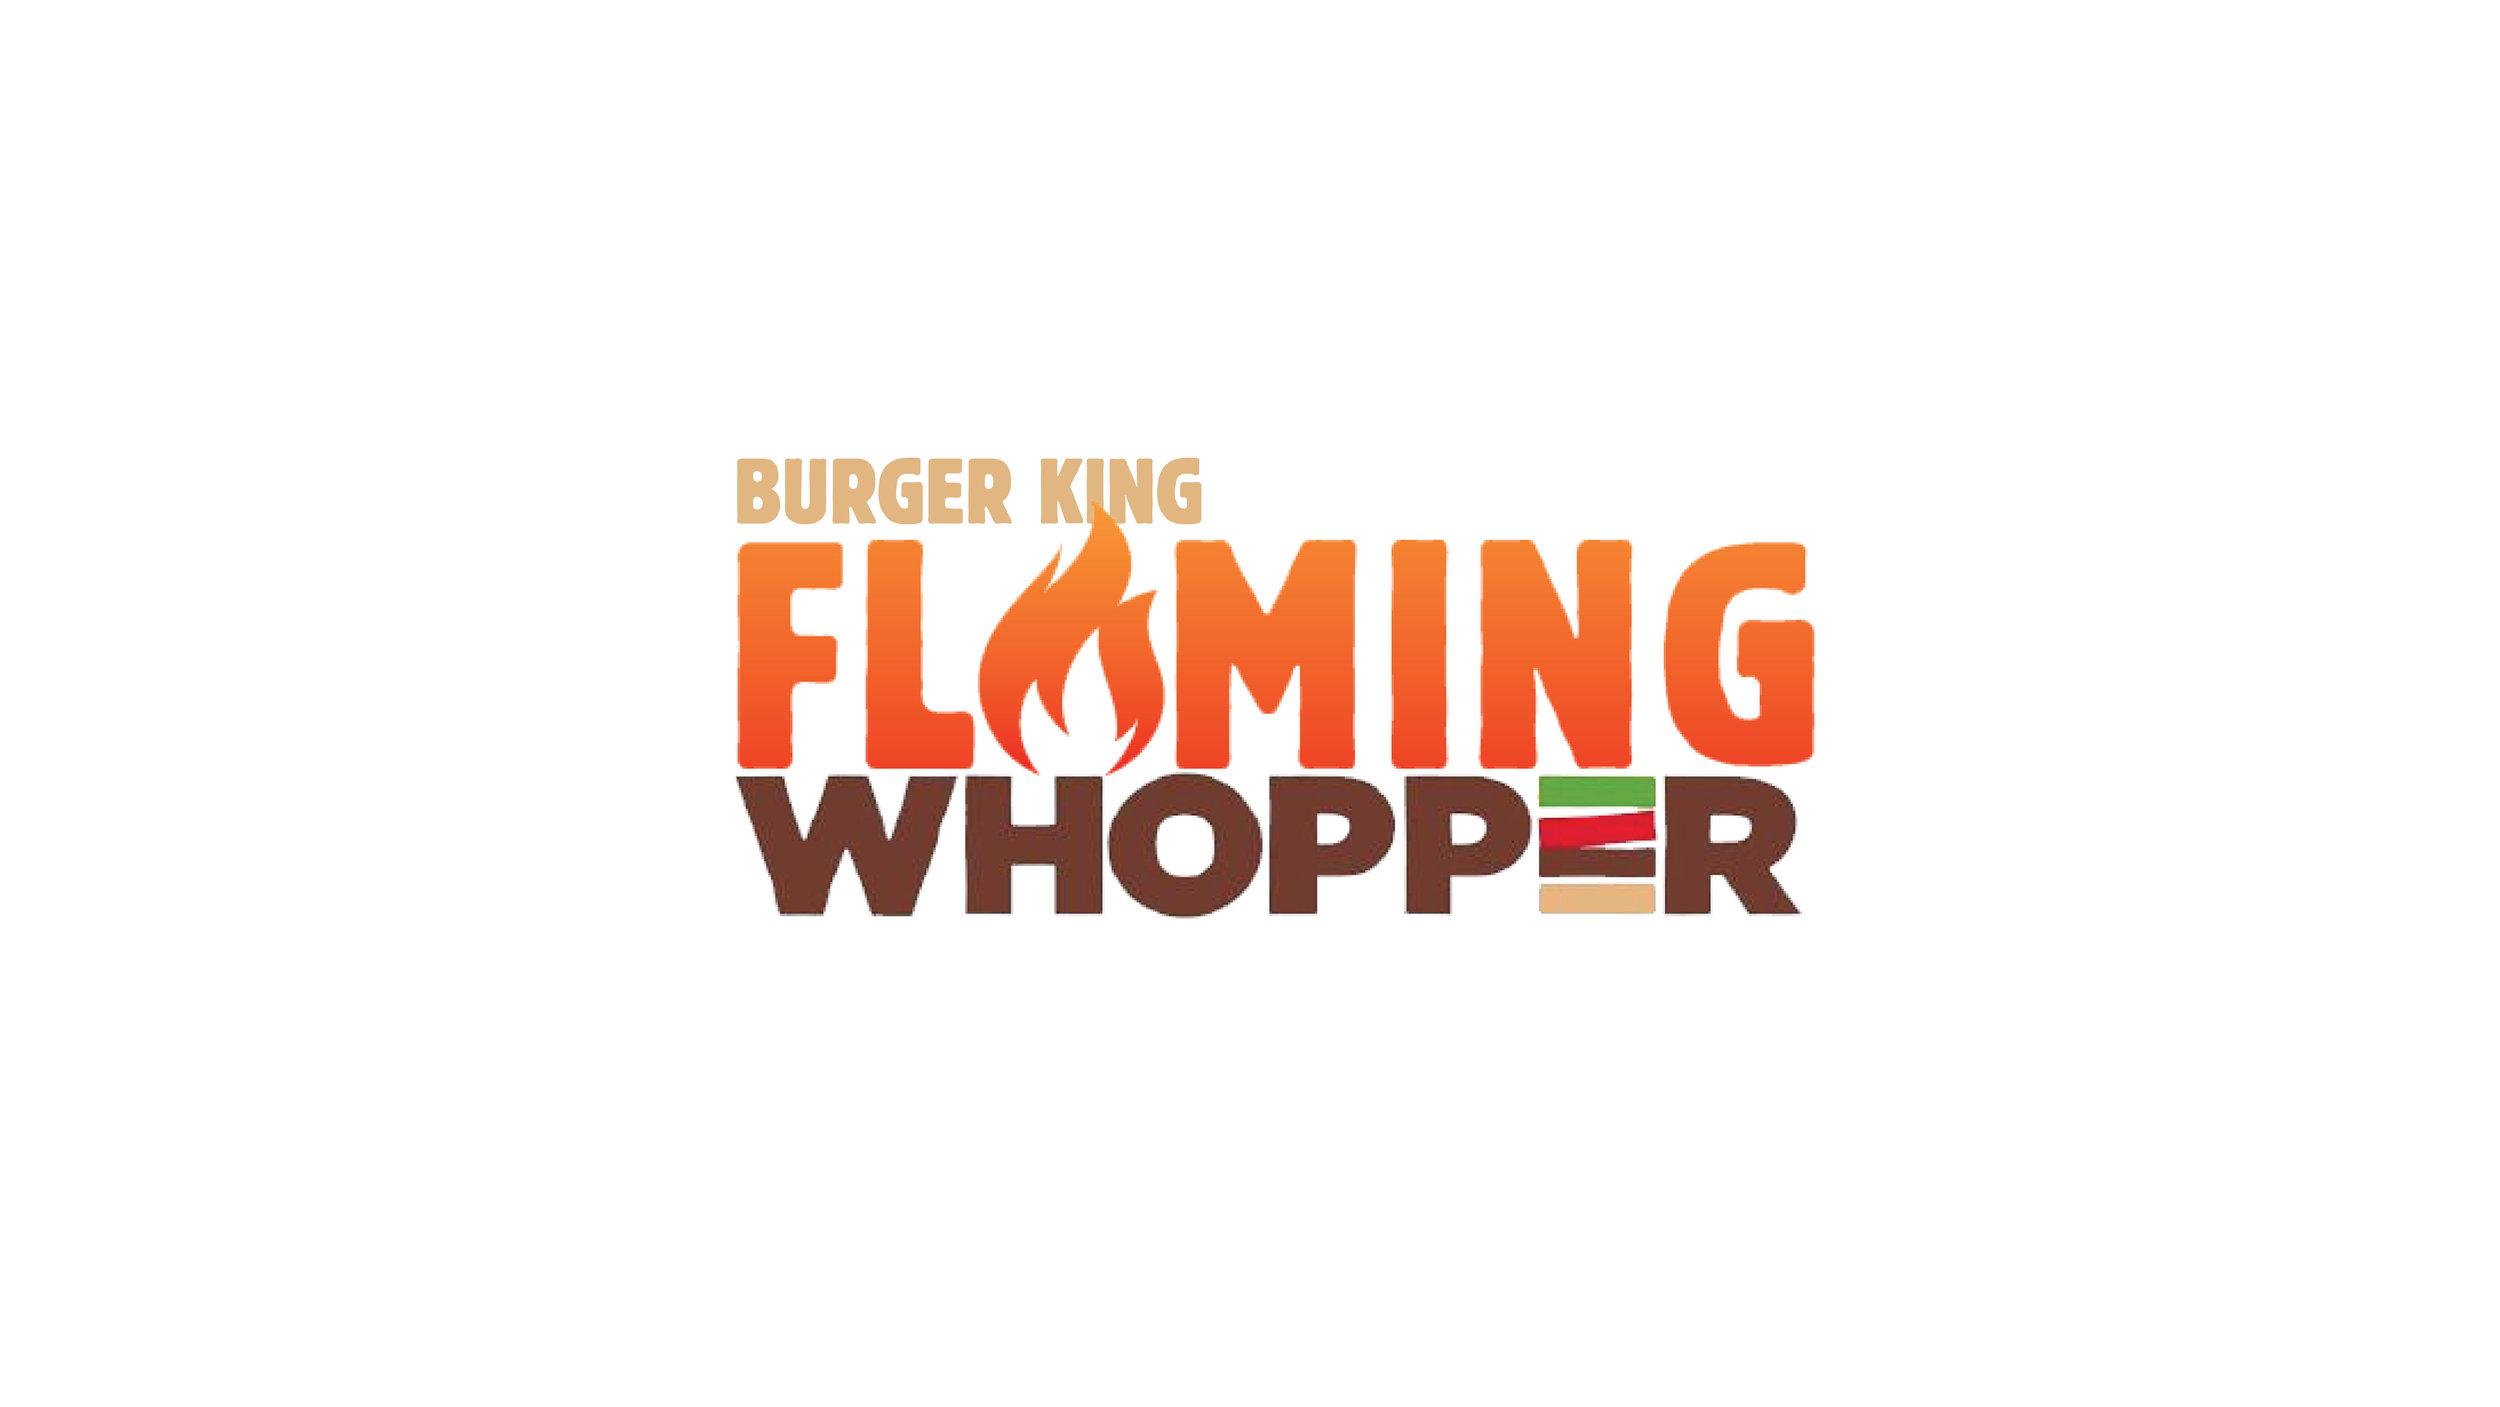 BK Flaming Whopper References-1.jpg